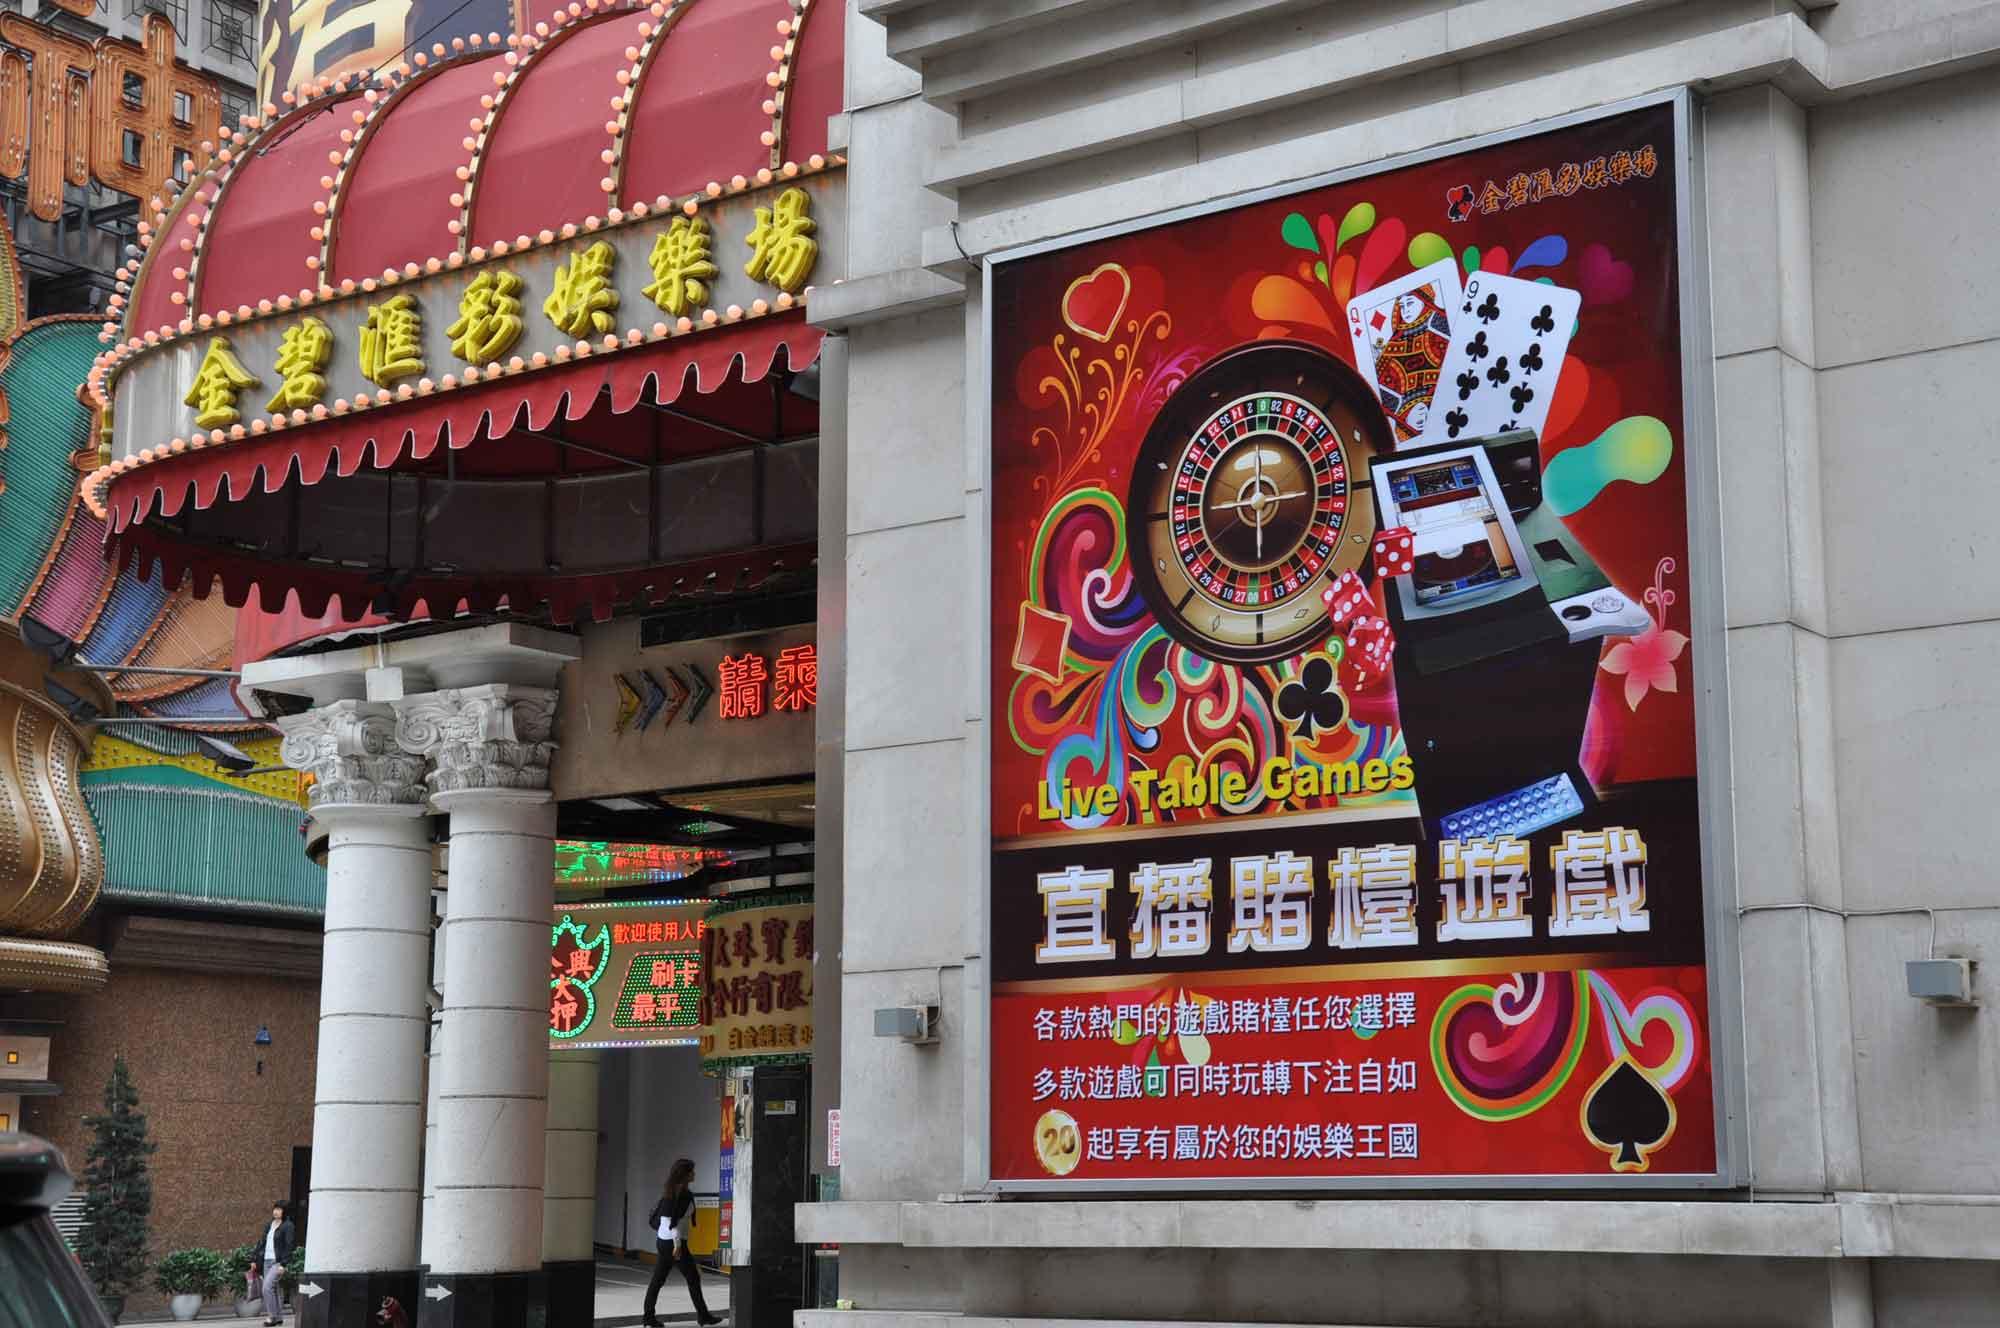 Paradise Kampek casino Macau entrance